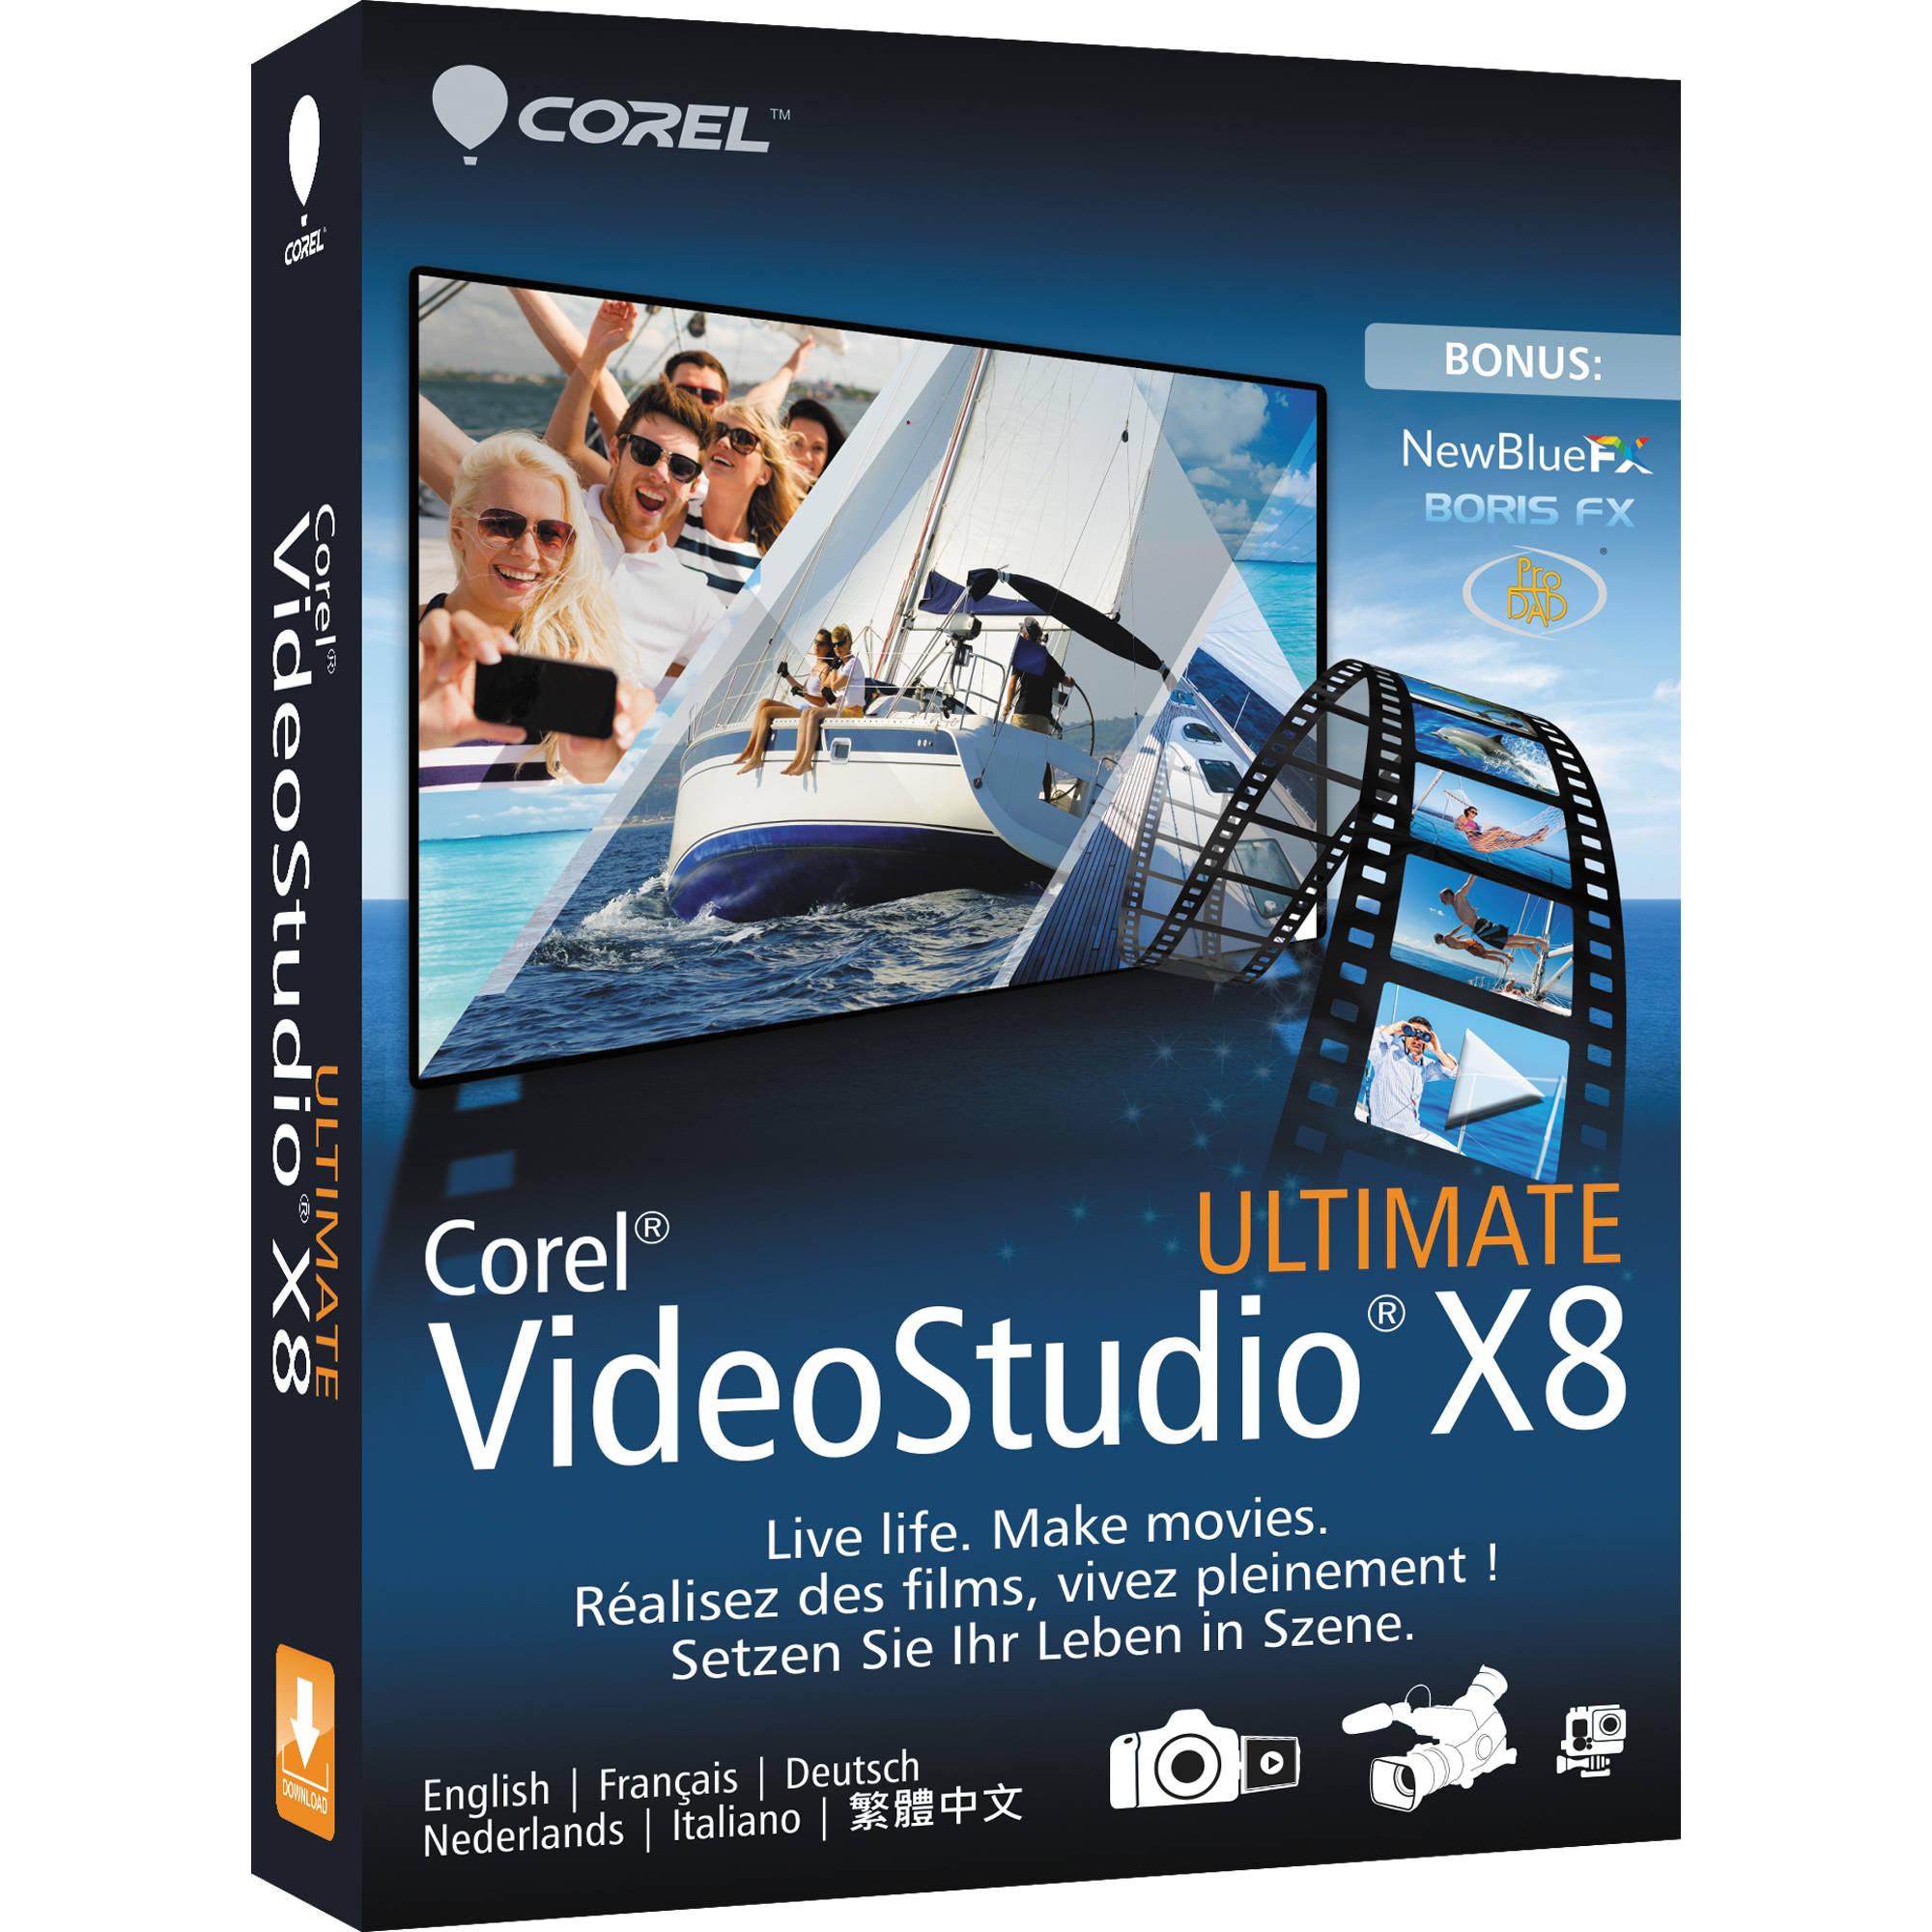 Corel videostudio ultimate 2019 free download.